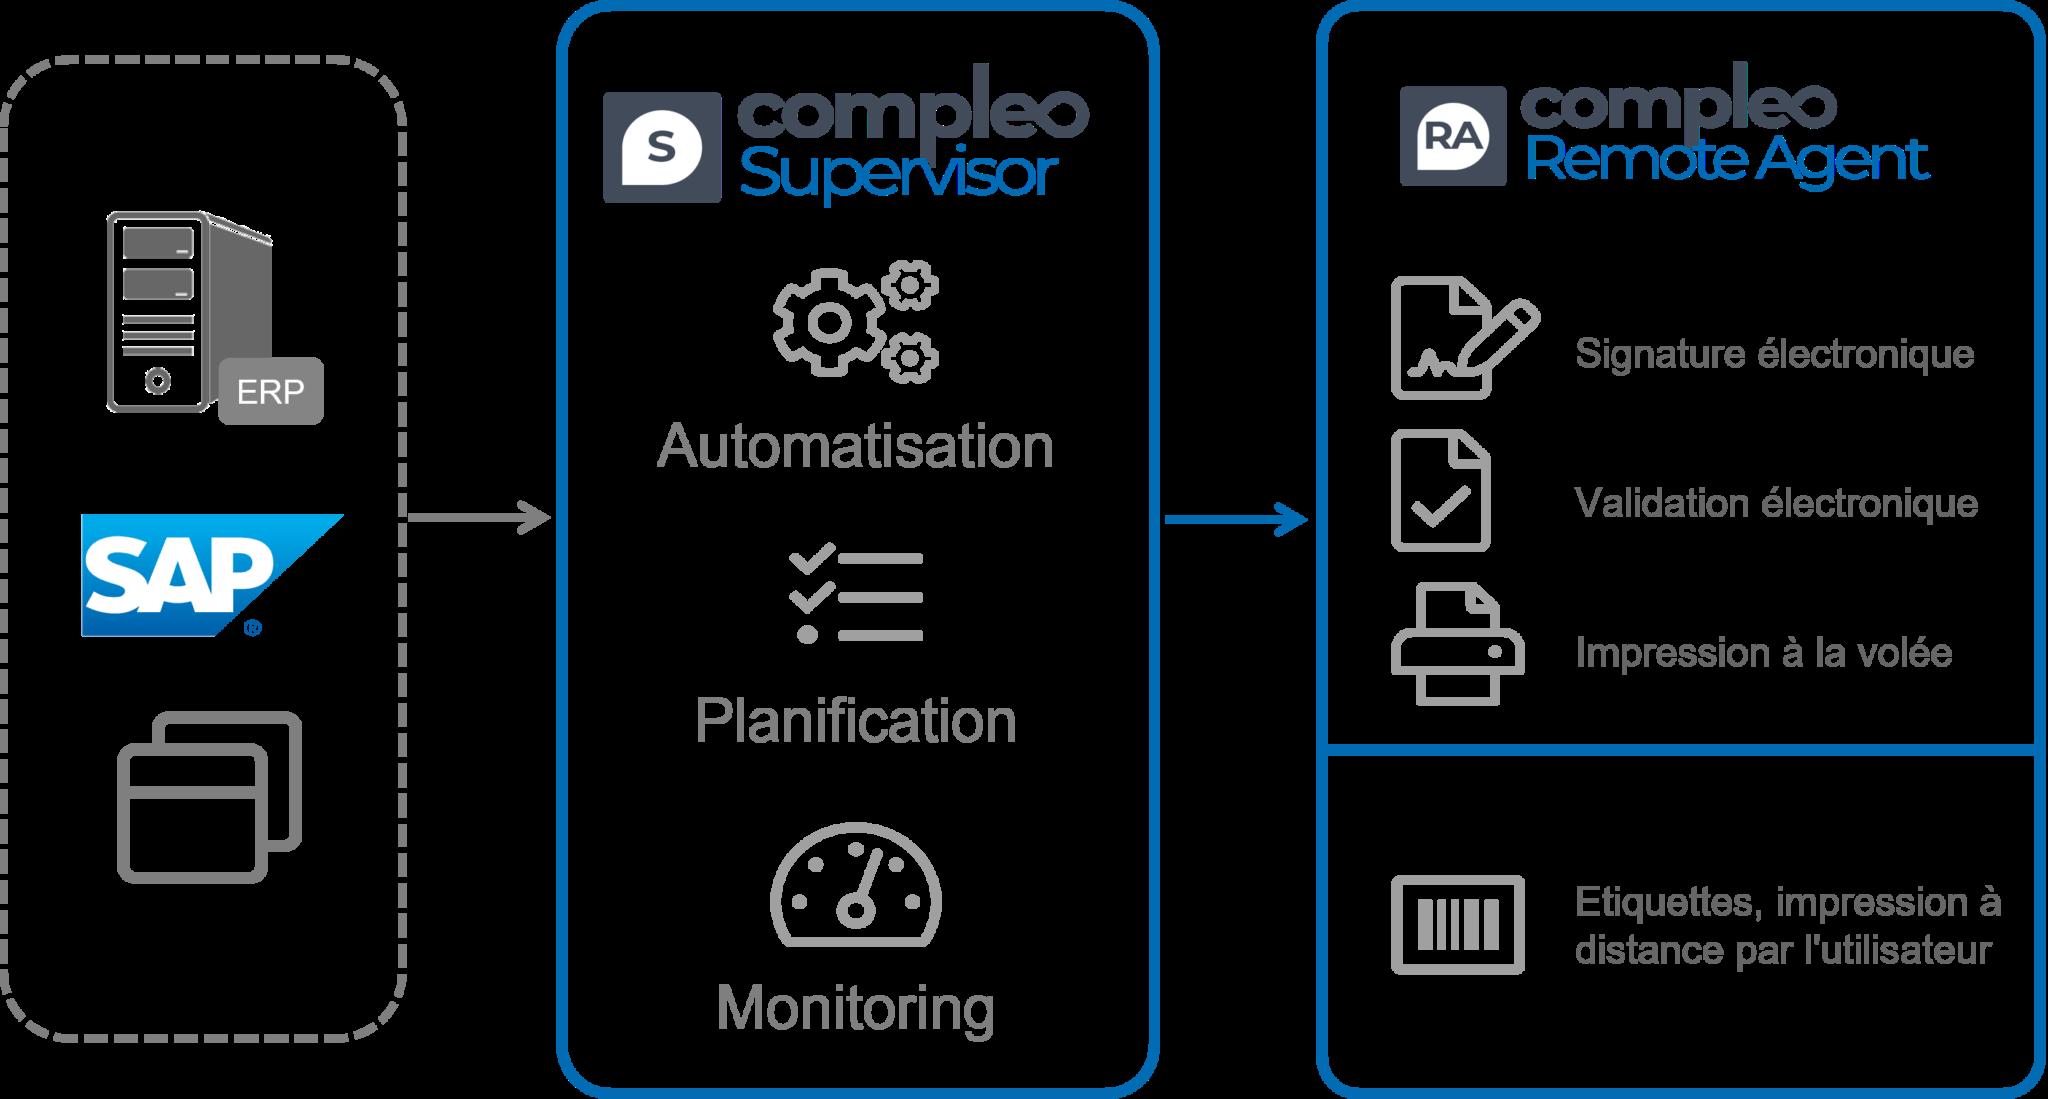 schema module Compleo remote agent